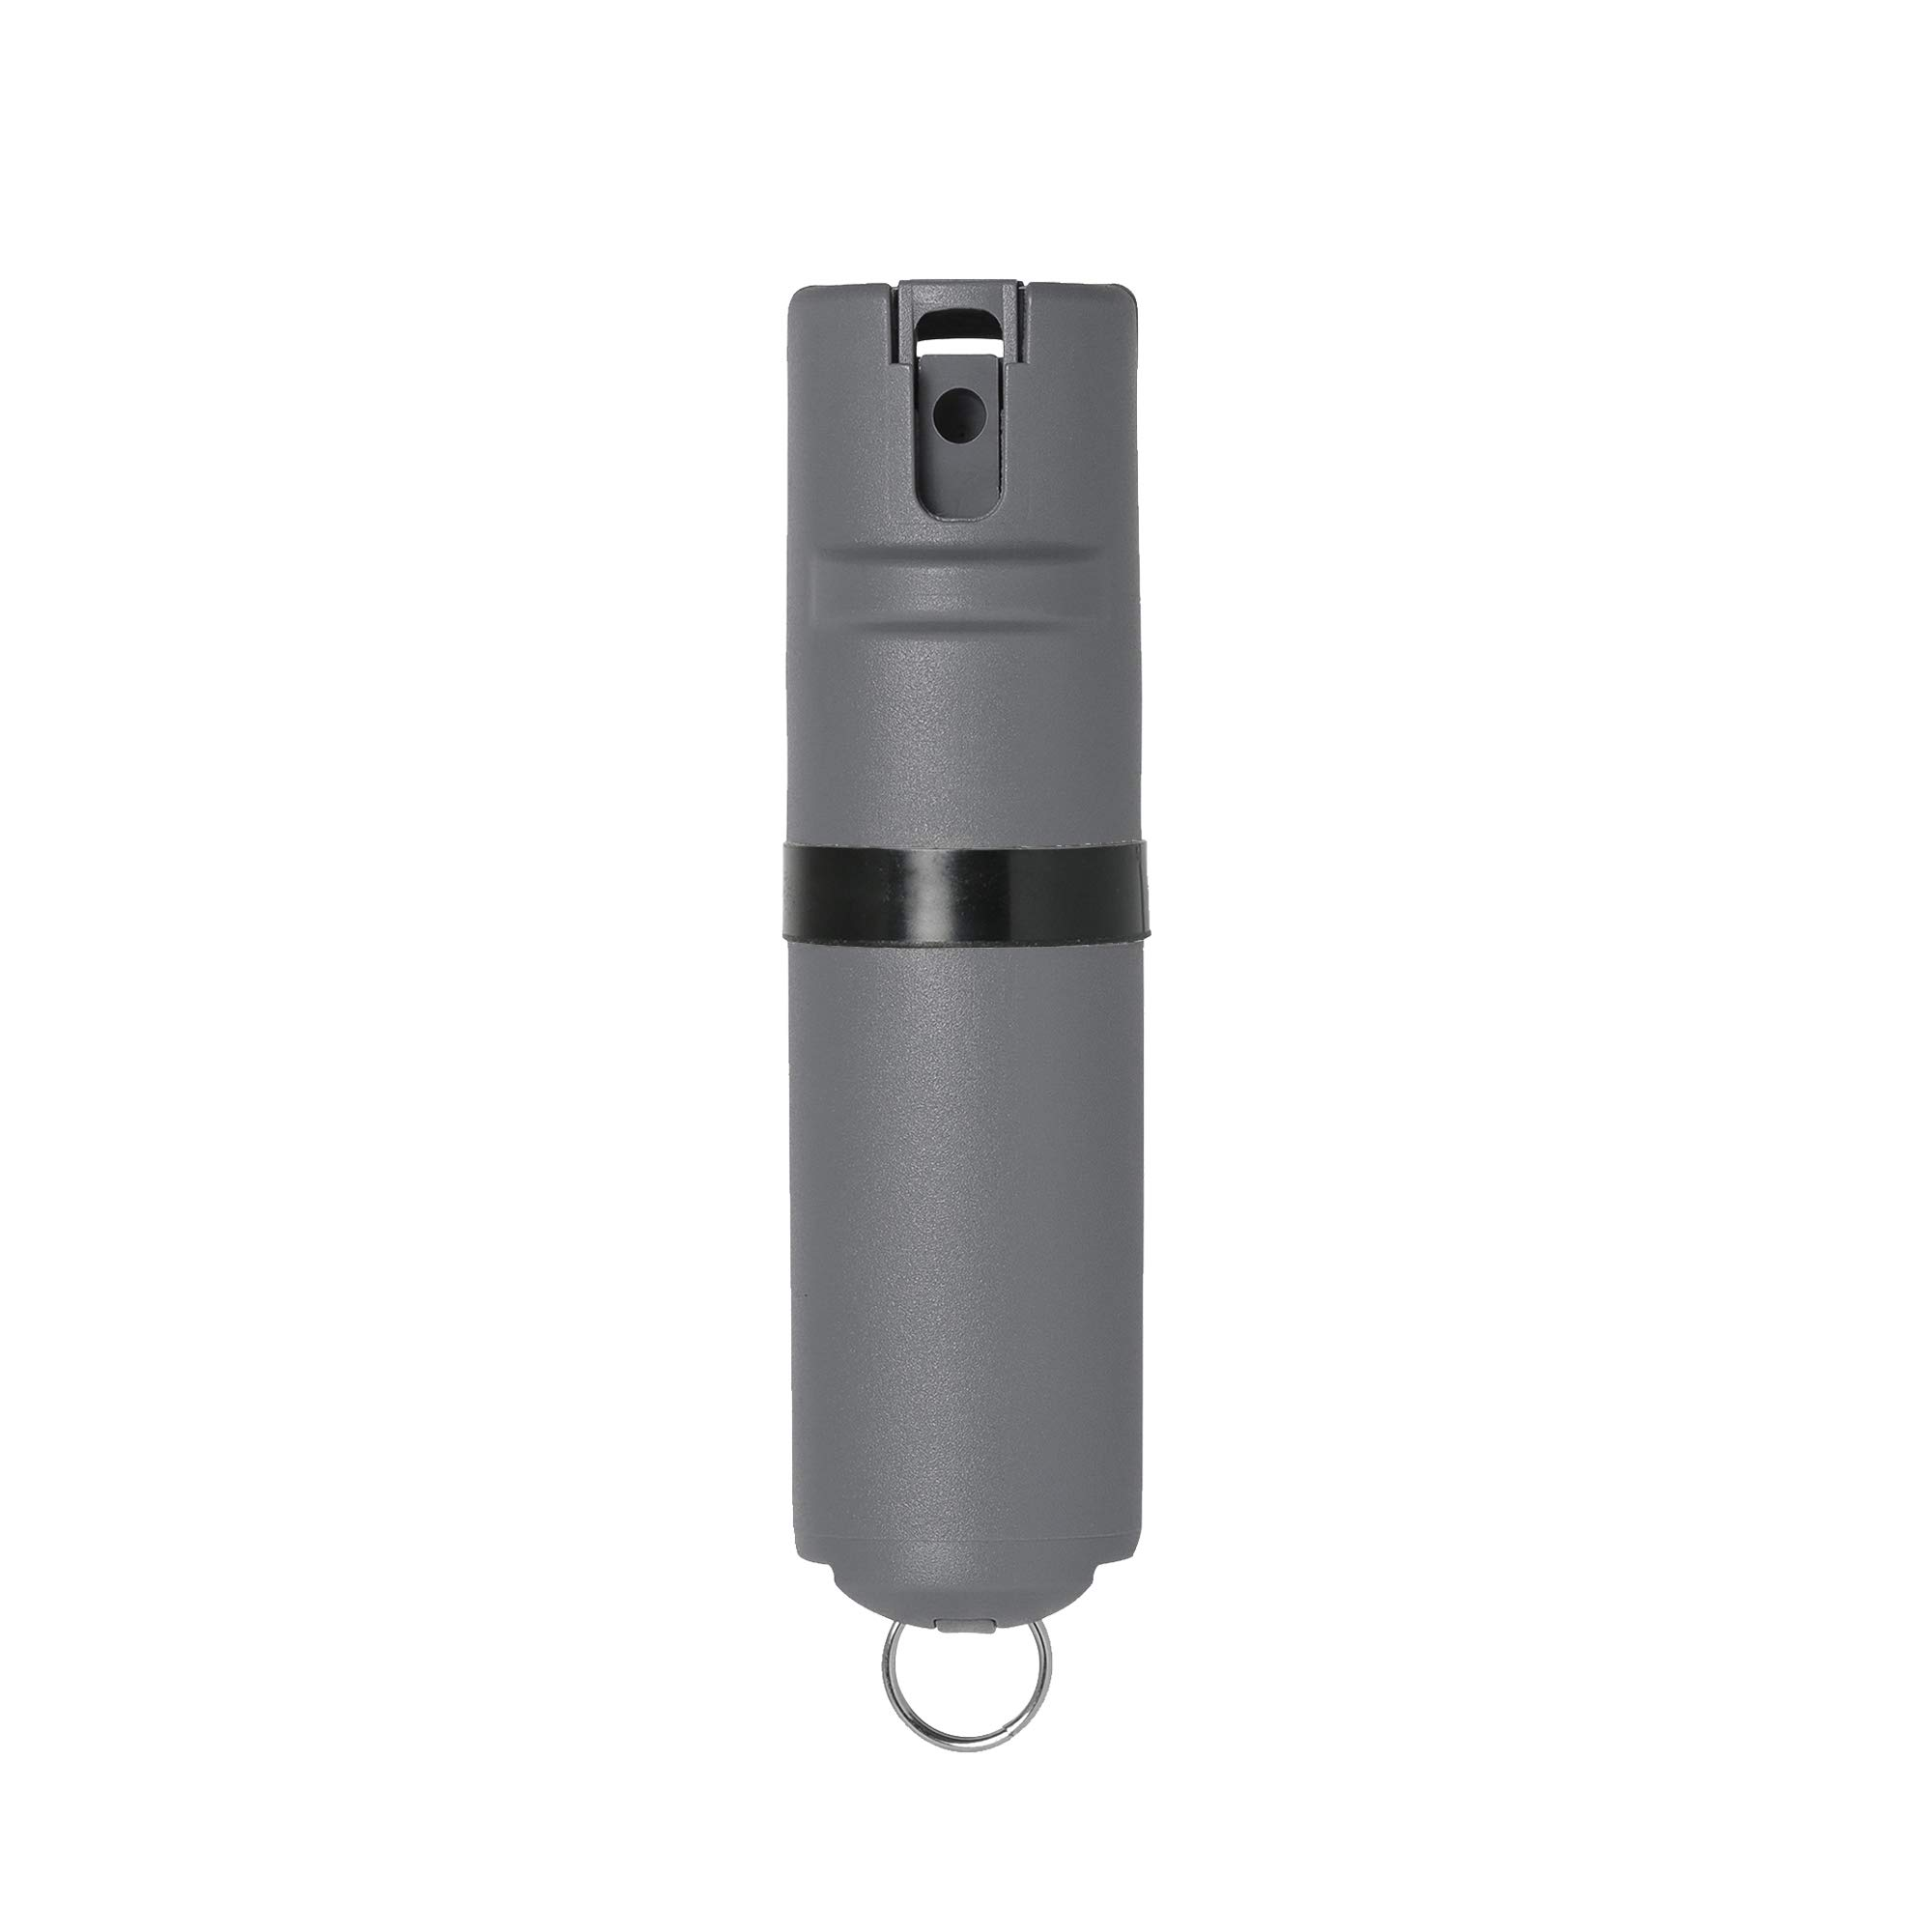 POM Grey Pepper Spray Keychain Model - Maximum Strength Self Defense OC Spray Safety Flip Top 10ft Range Compact Discreet for Keys Backpack Quick Key Release (Black) by POM